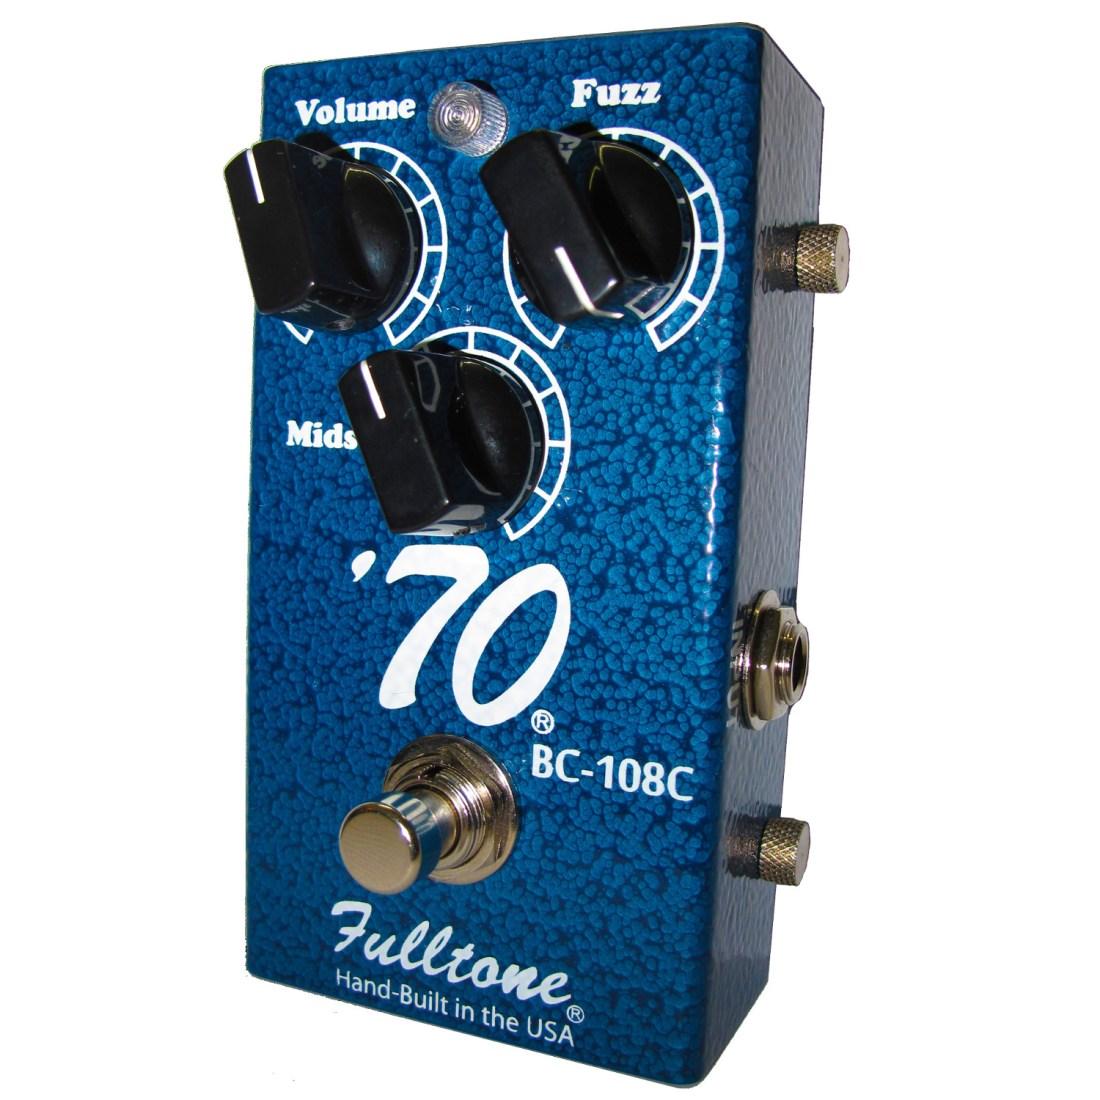 Fulltone 70-BC fuzz pedal